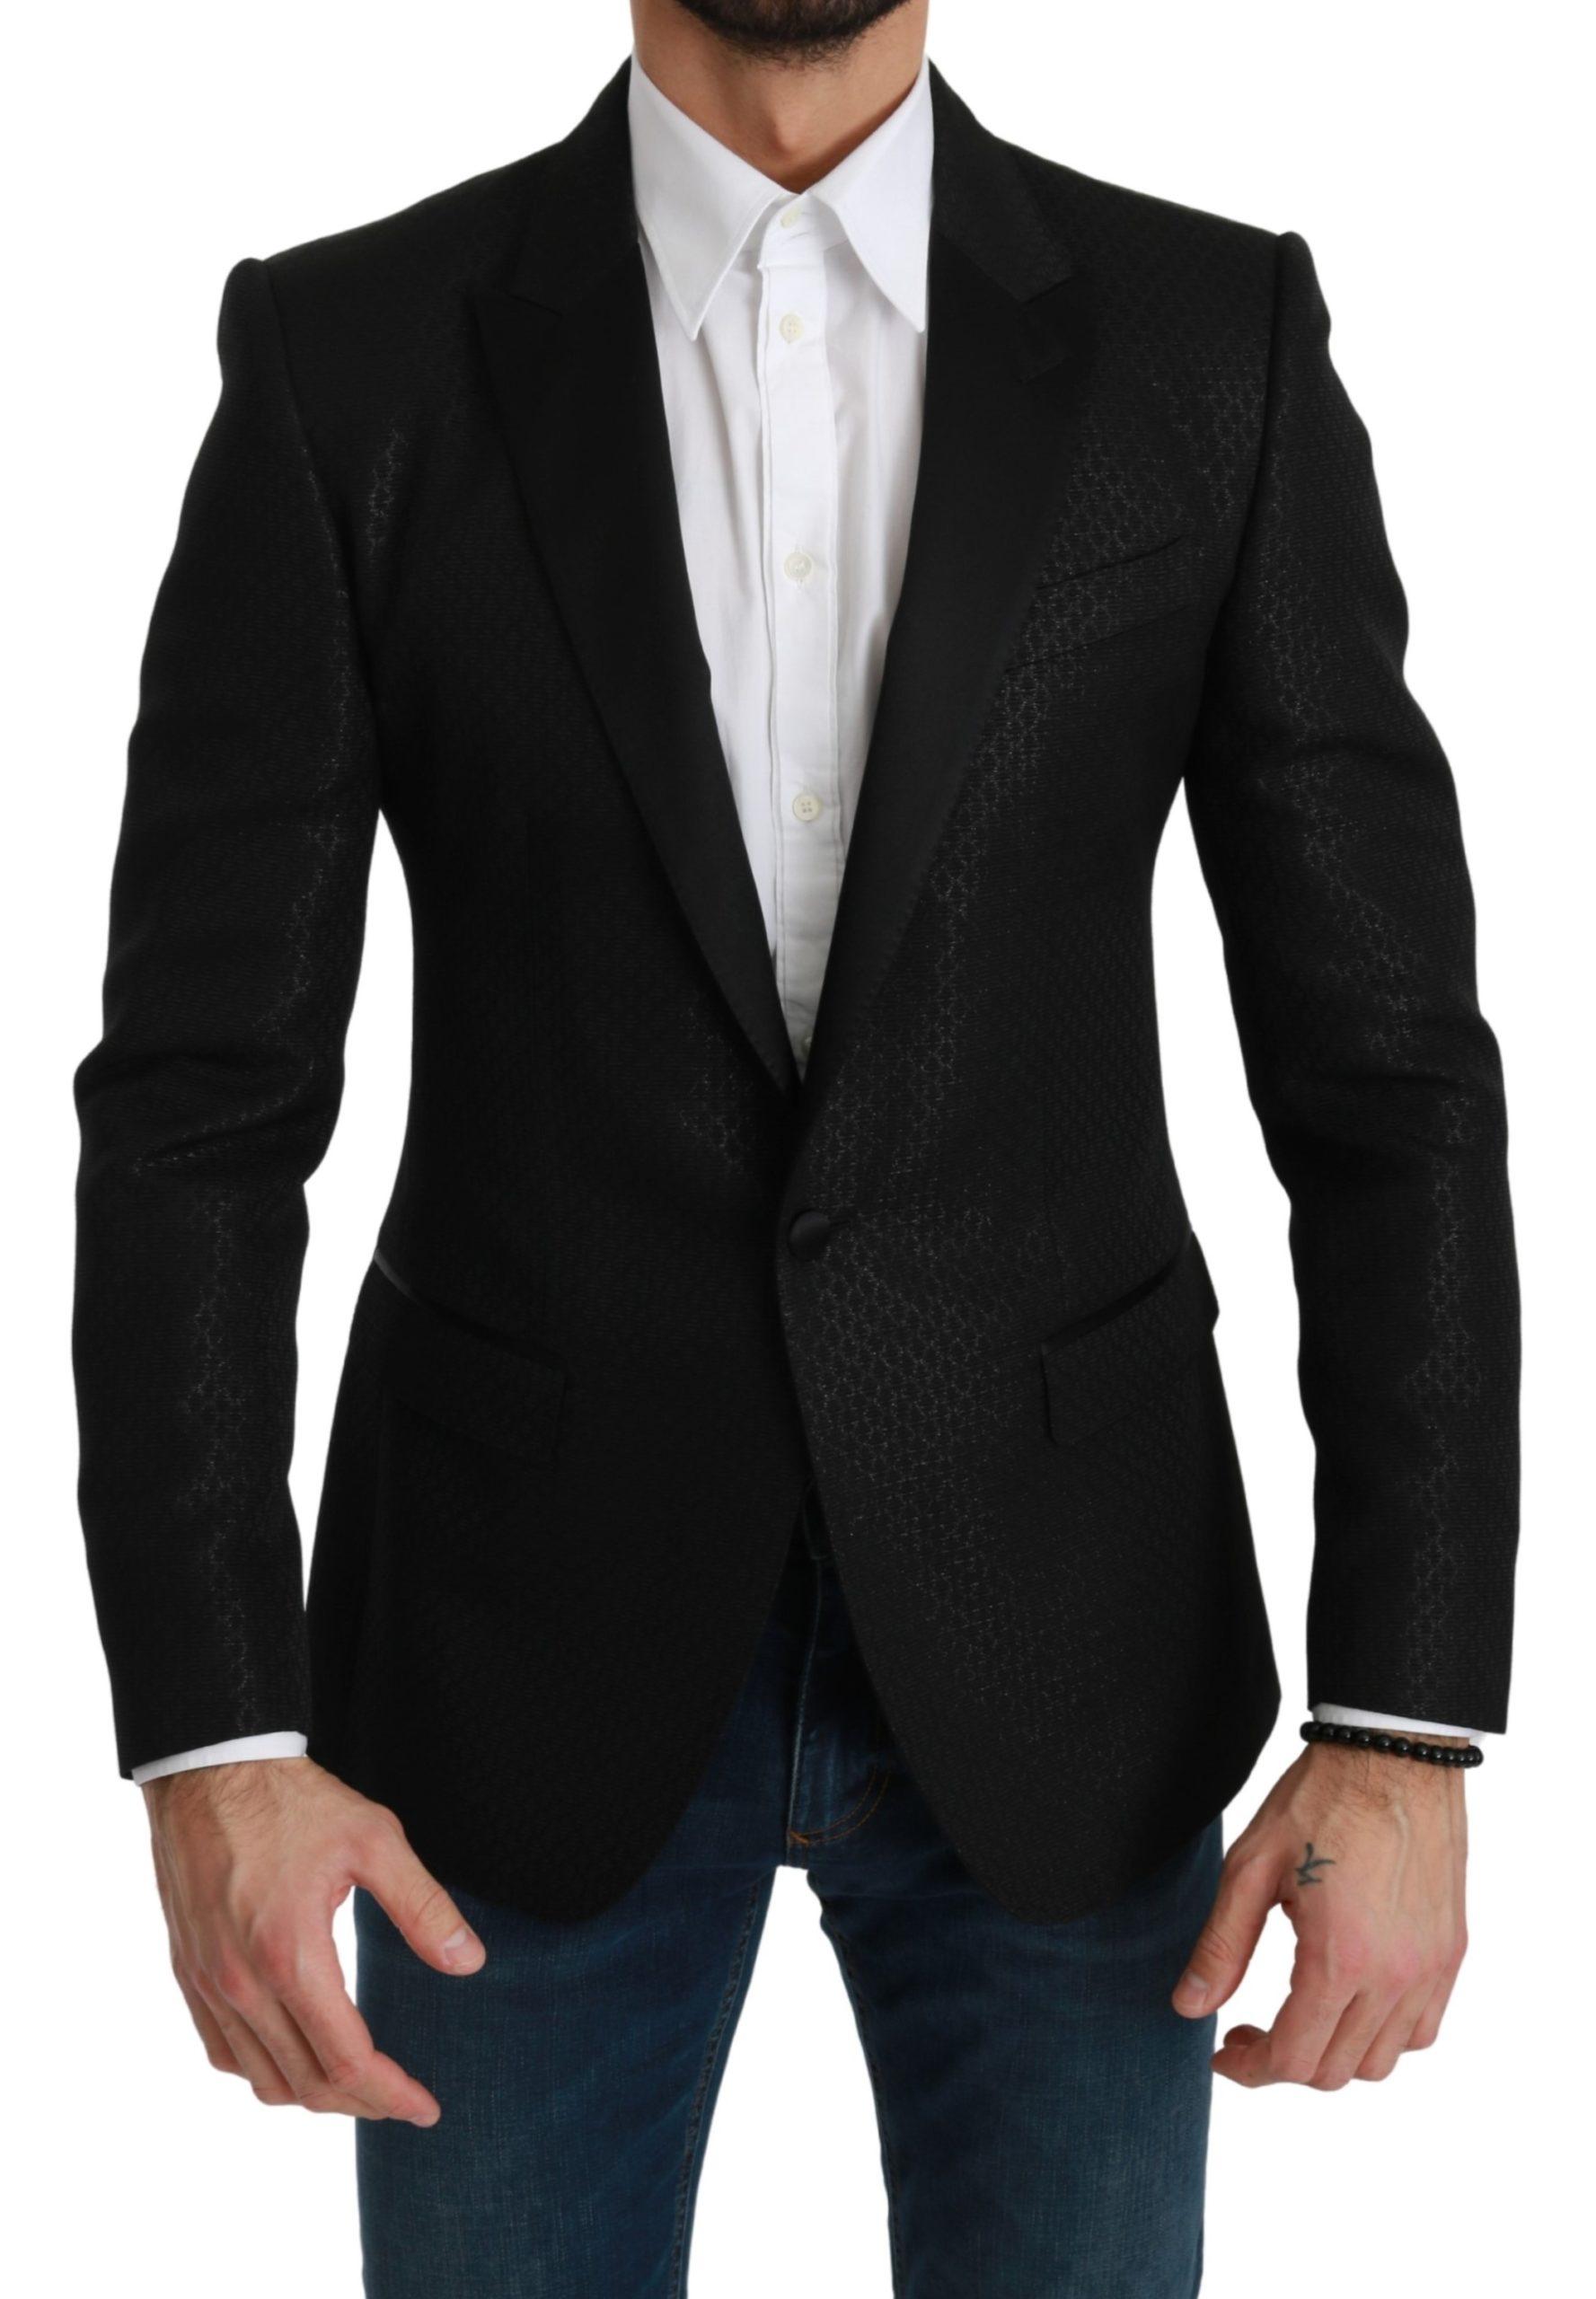 Dolce & Gabbana Men's Slim Fit Jacket MARTINI Blazer Black KOS1776 - IT46 | S